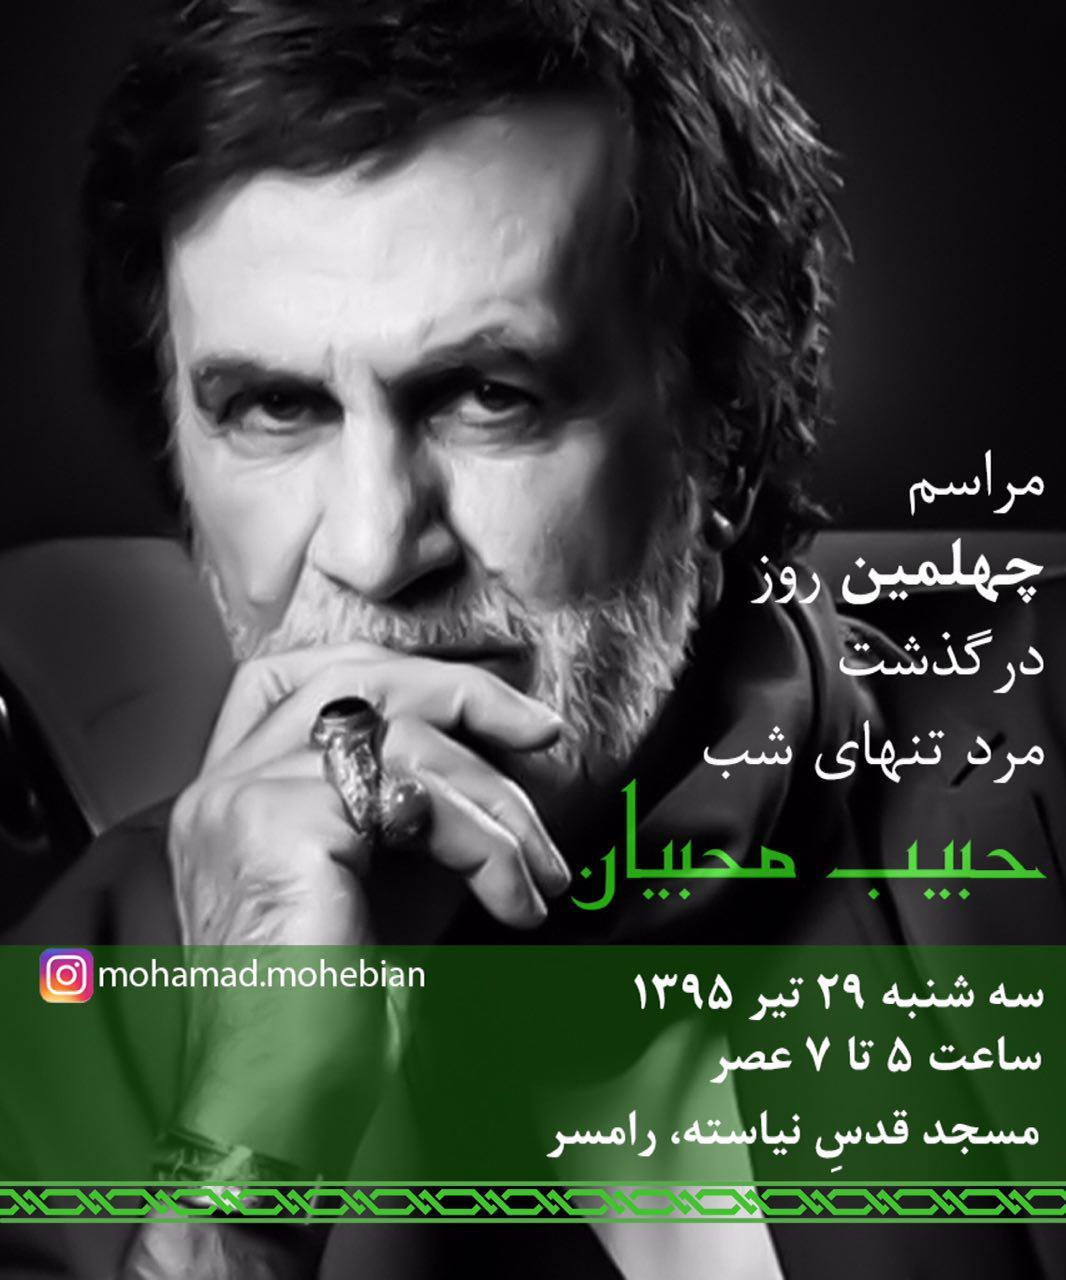 marasem_chehellom_Zendeh_Yad_Habib_Mohebian.jpg